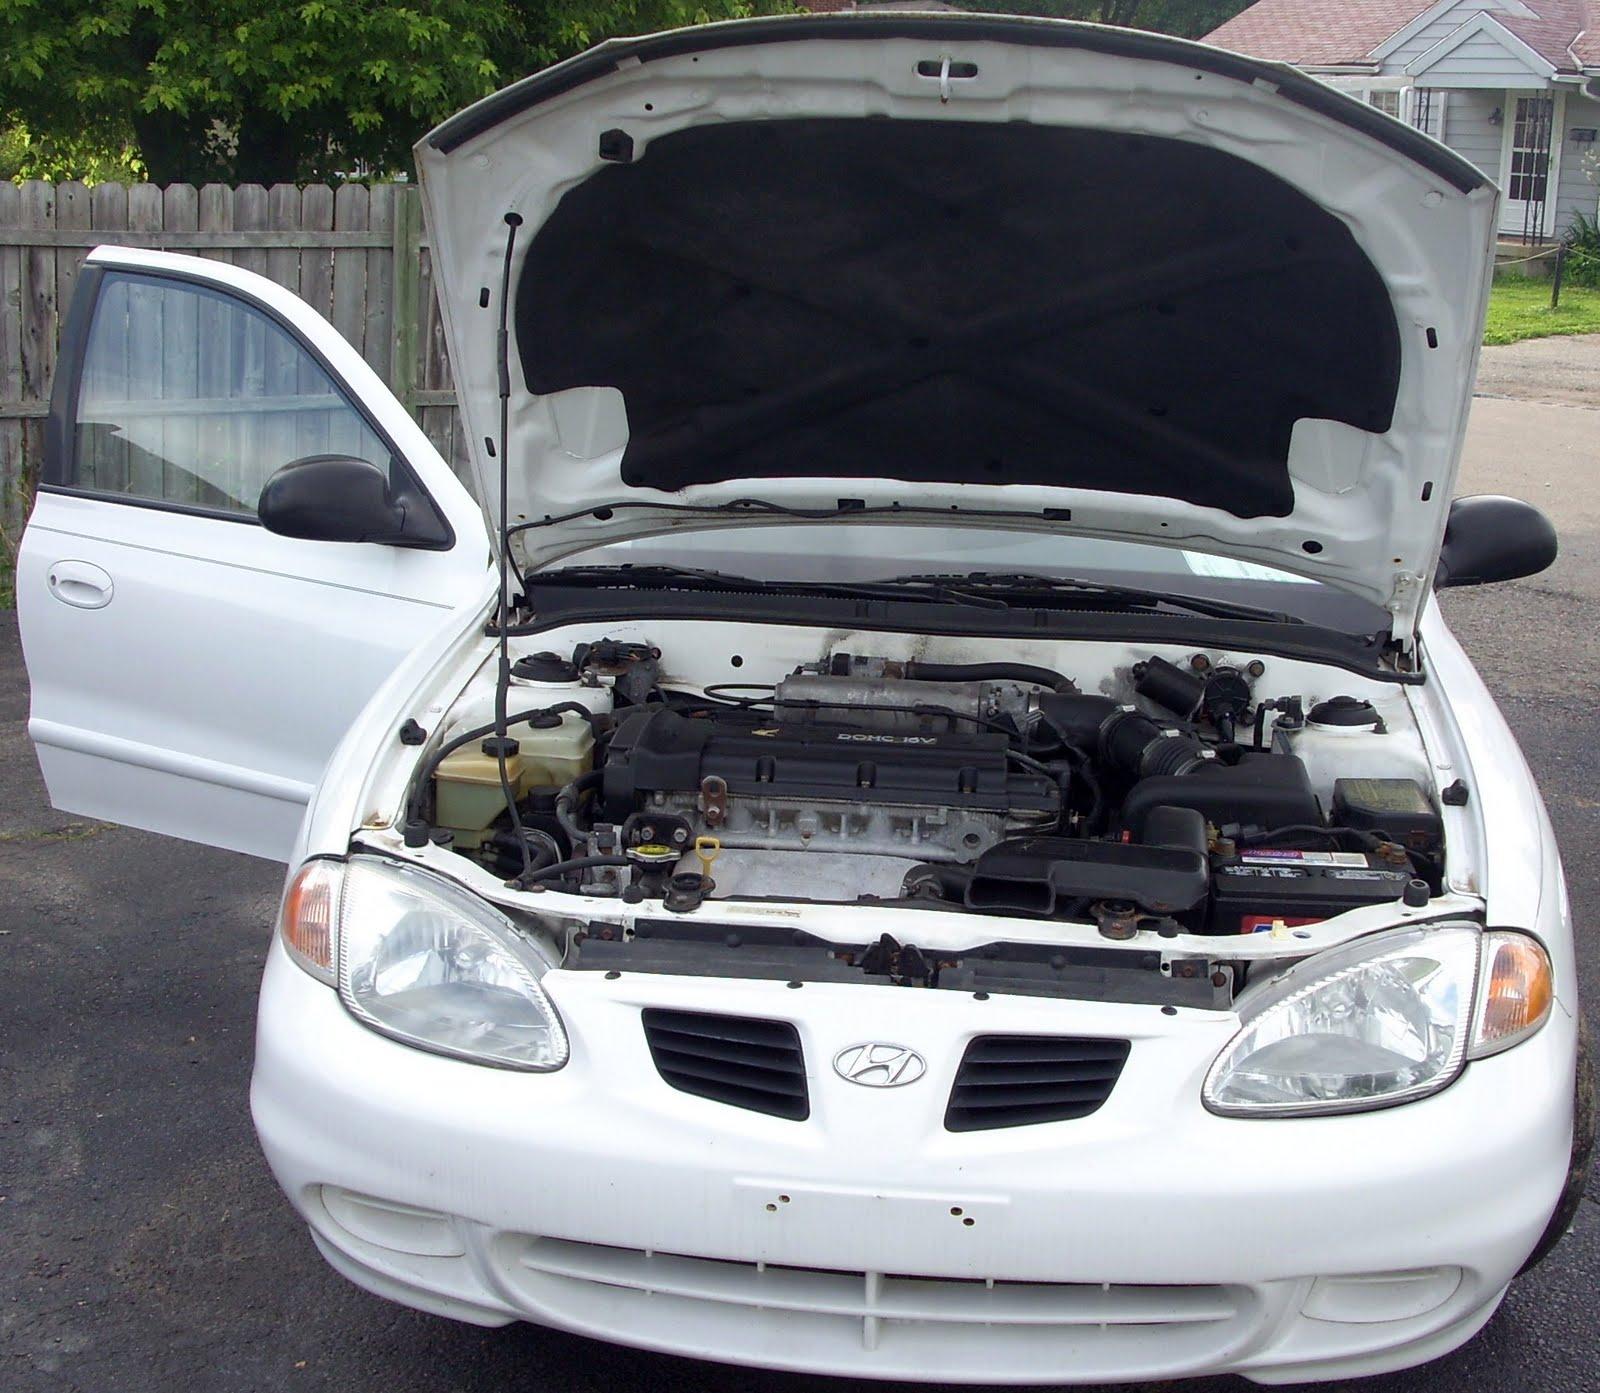 Dayton Hyundai: Used Cars Dayton Ohio: 1999 Hyundai Elantra 4Dr. White 137,128